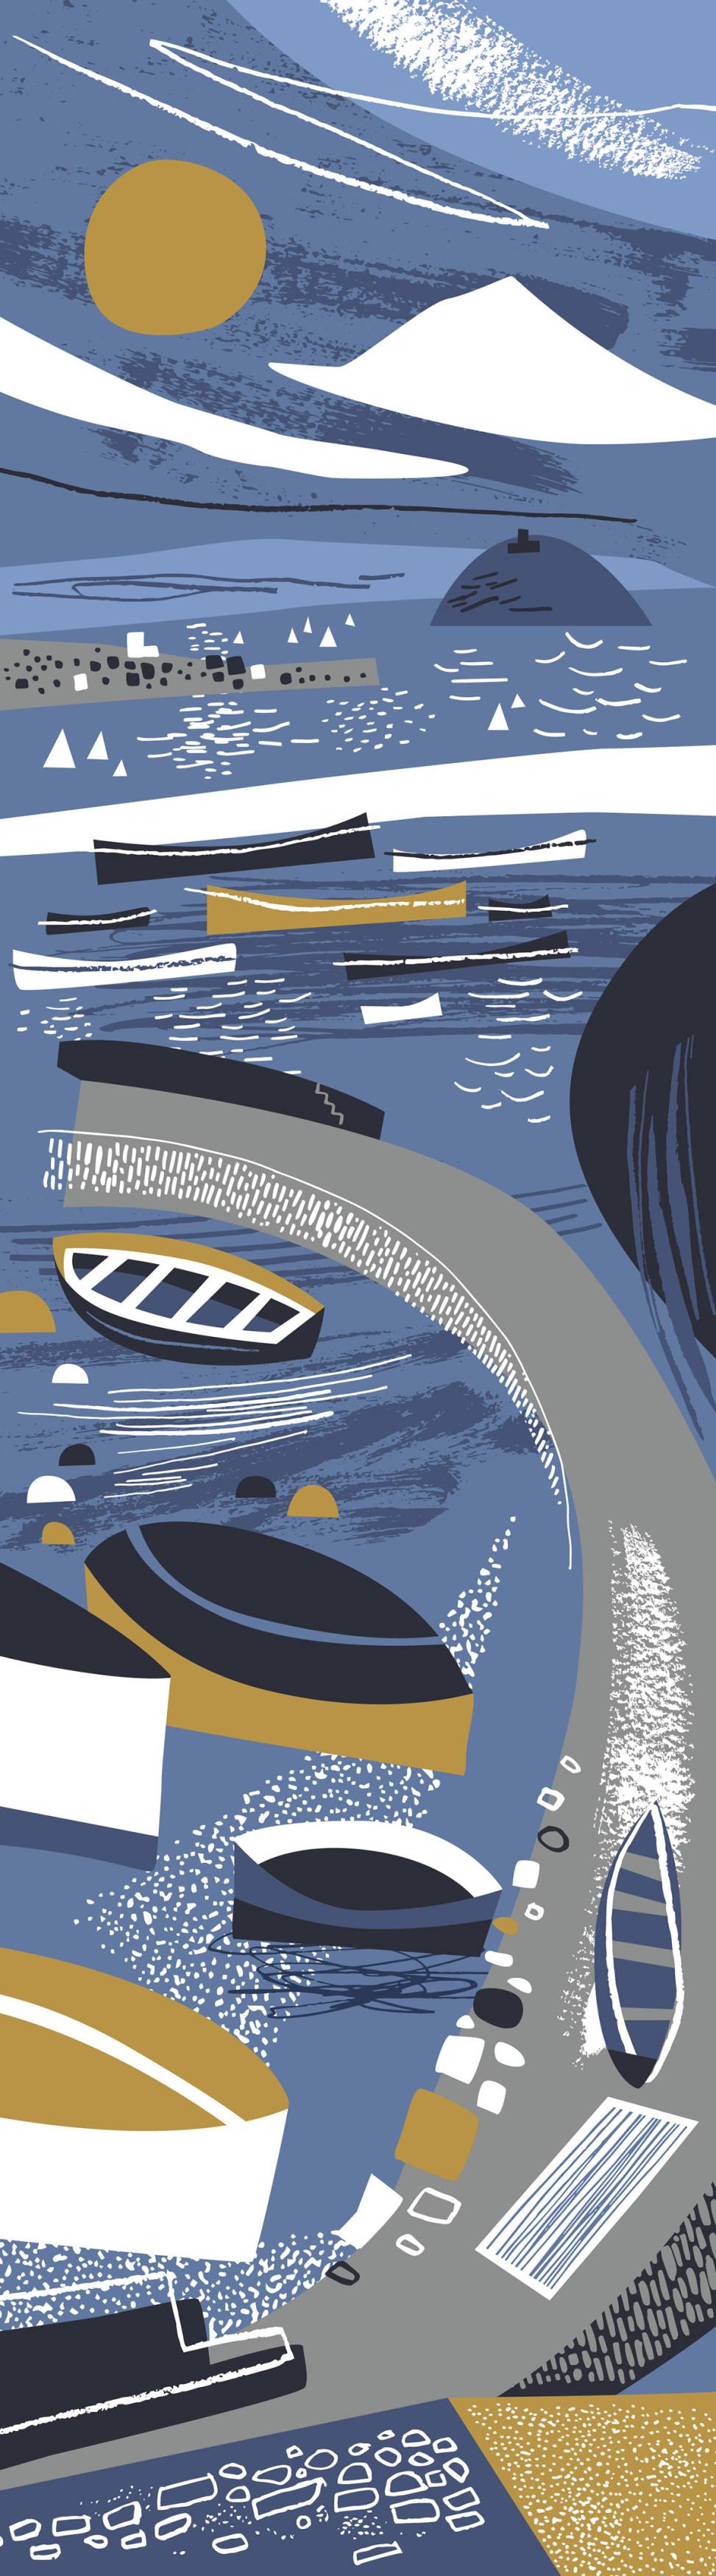 Newlyn Harbour print design by Matt Johnson